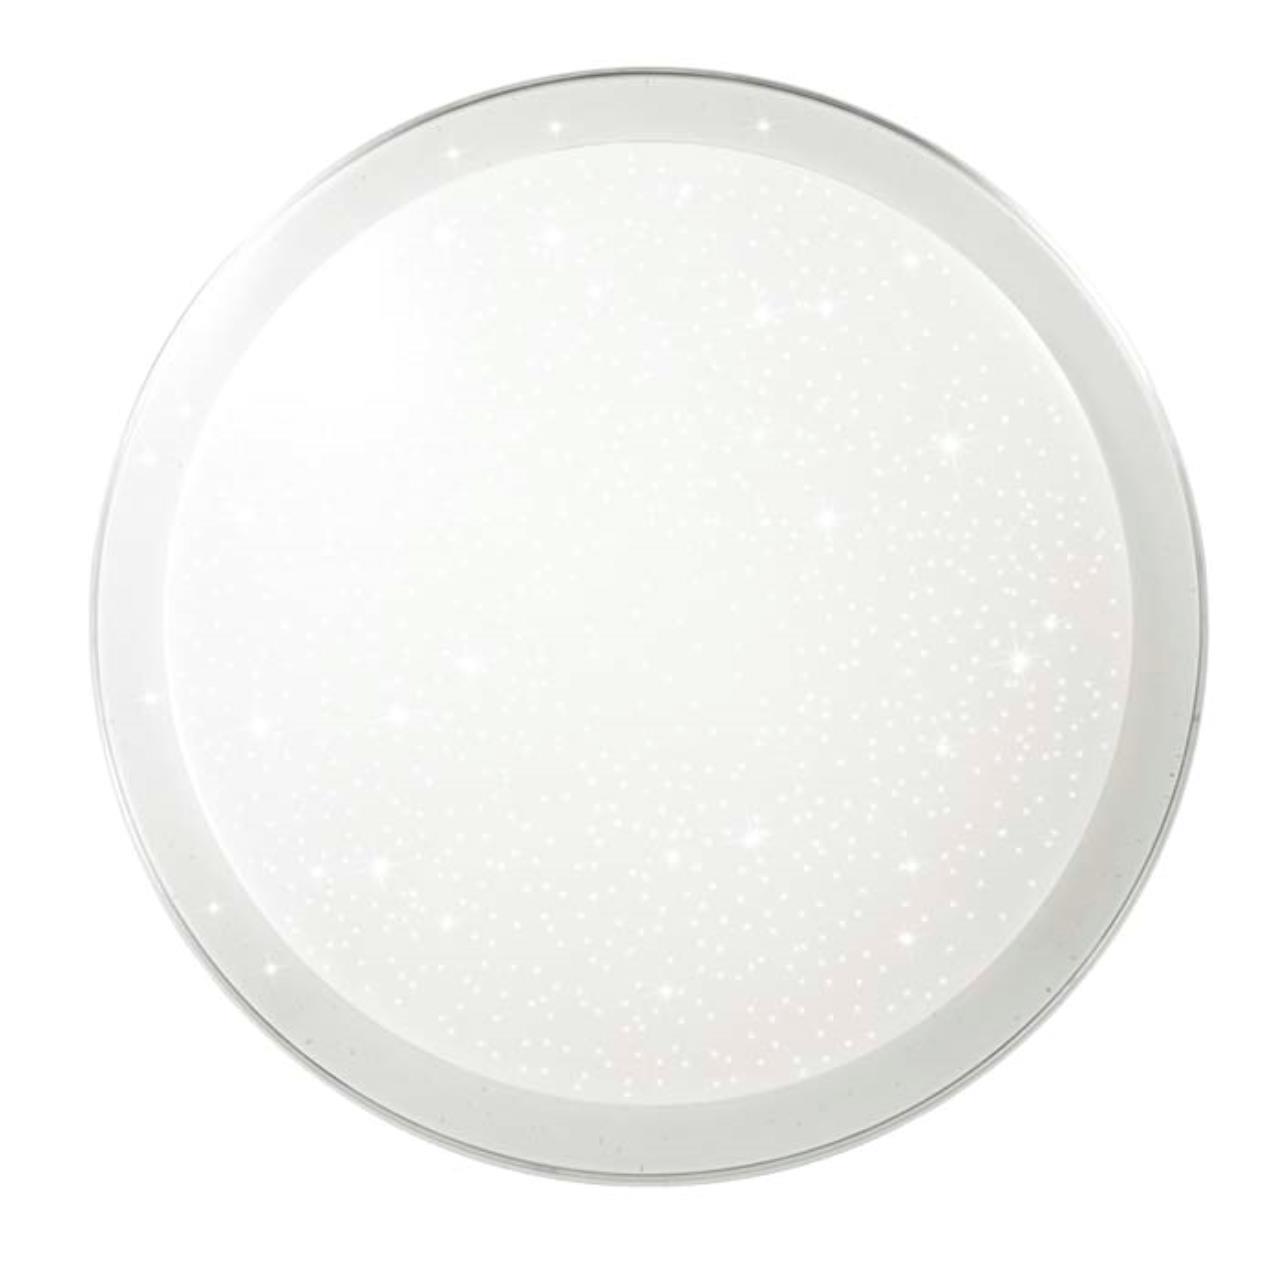 2015/D SN 098 св-к KASTA пластик LED 48Вт 4000K D350 IP43